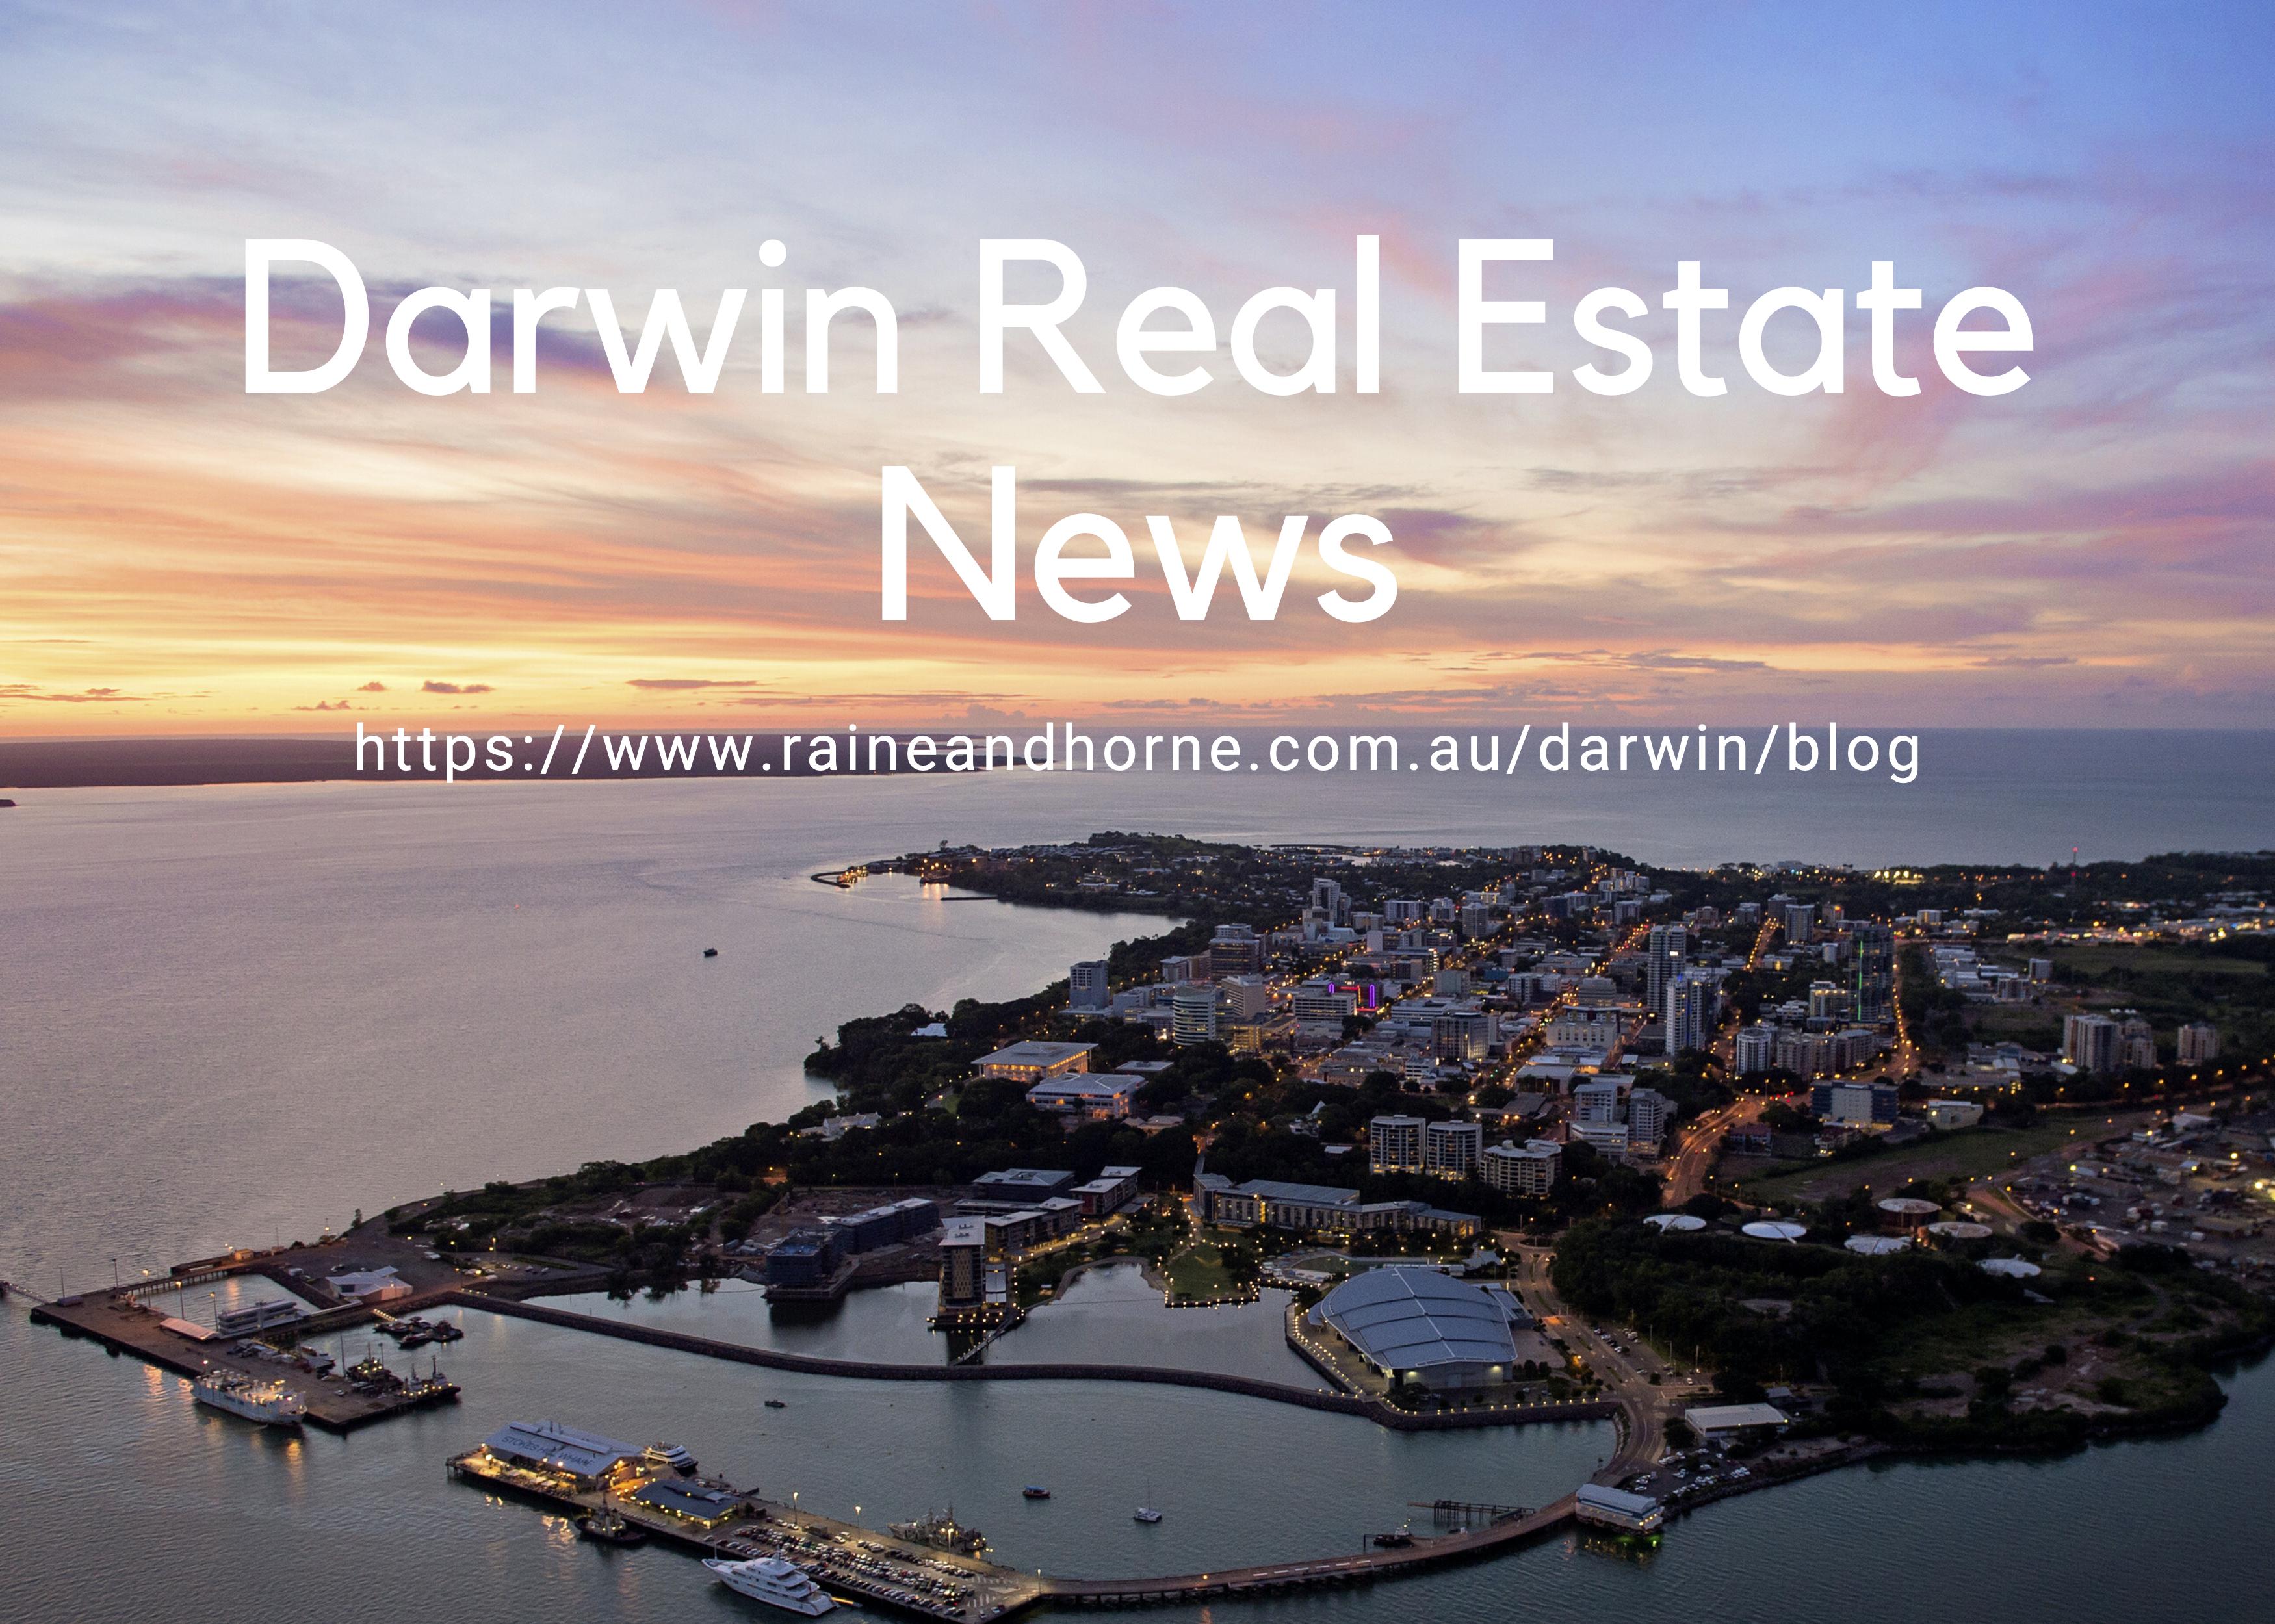 Raine & Horne Darwin Real Estate News